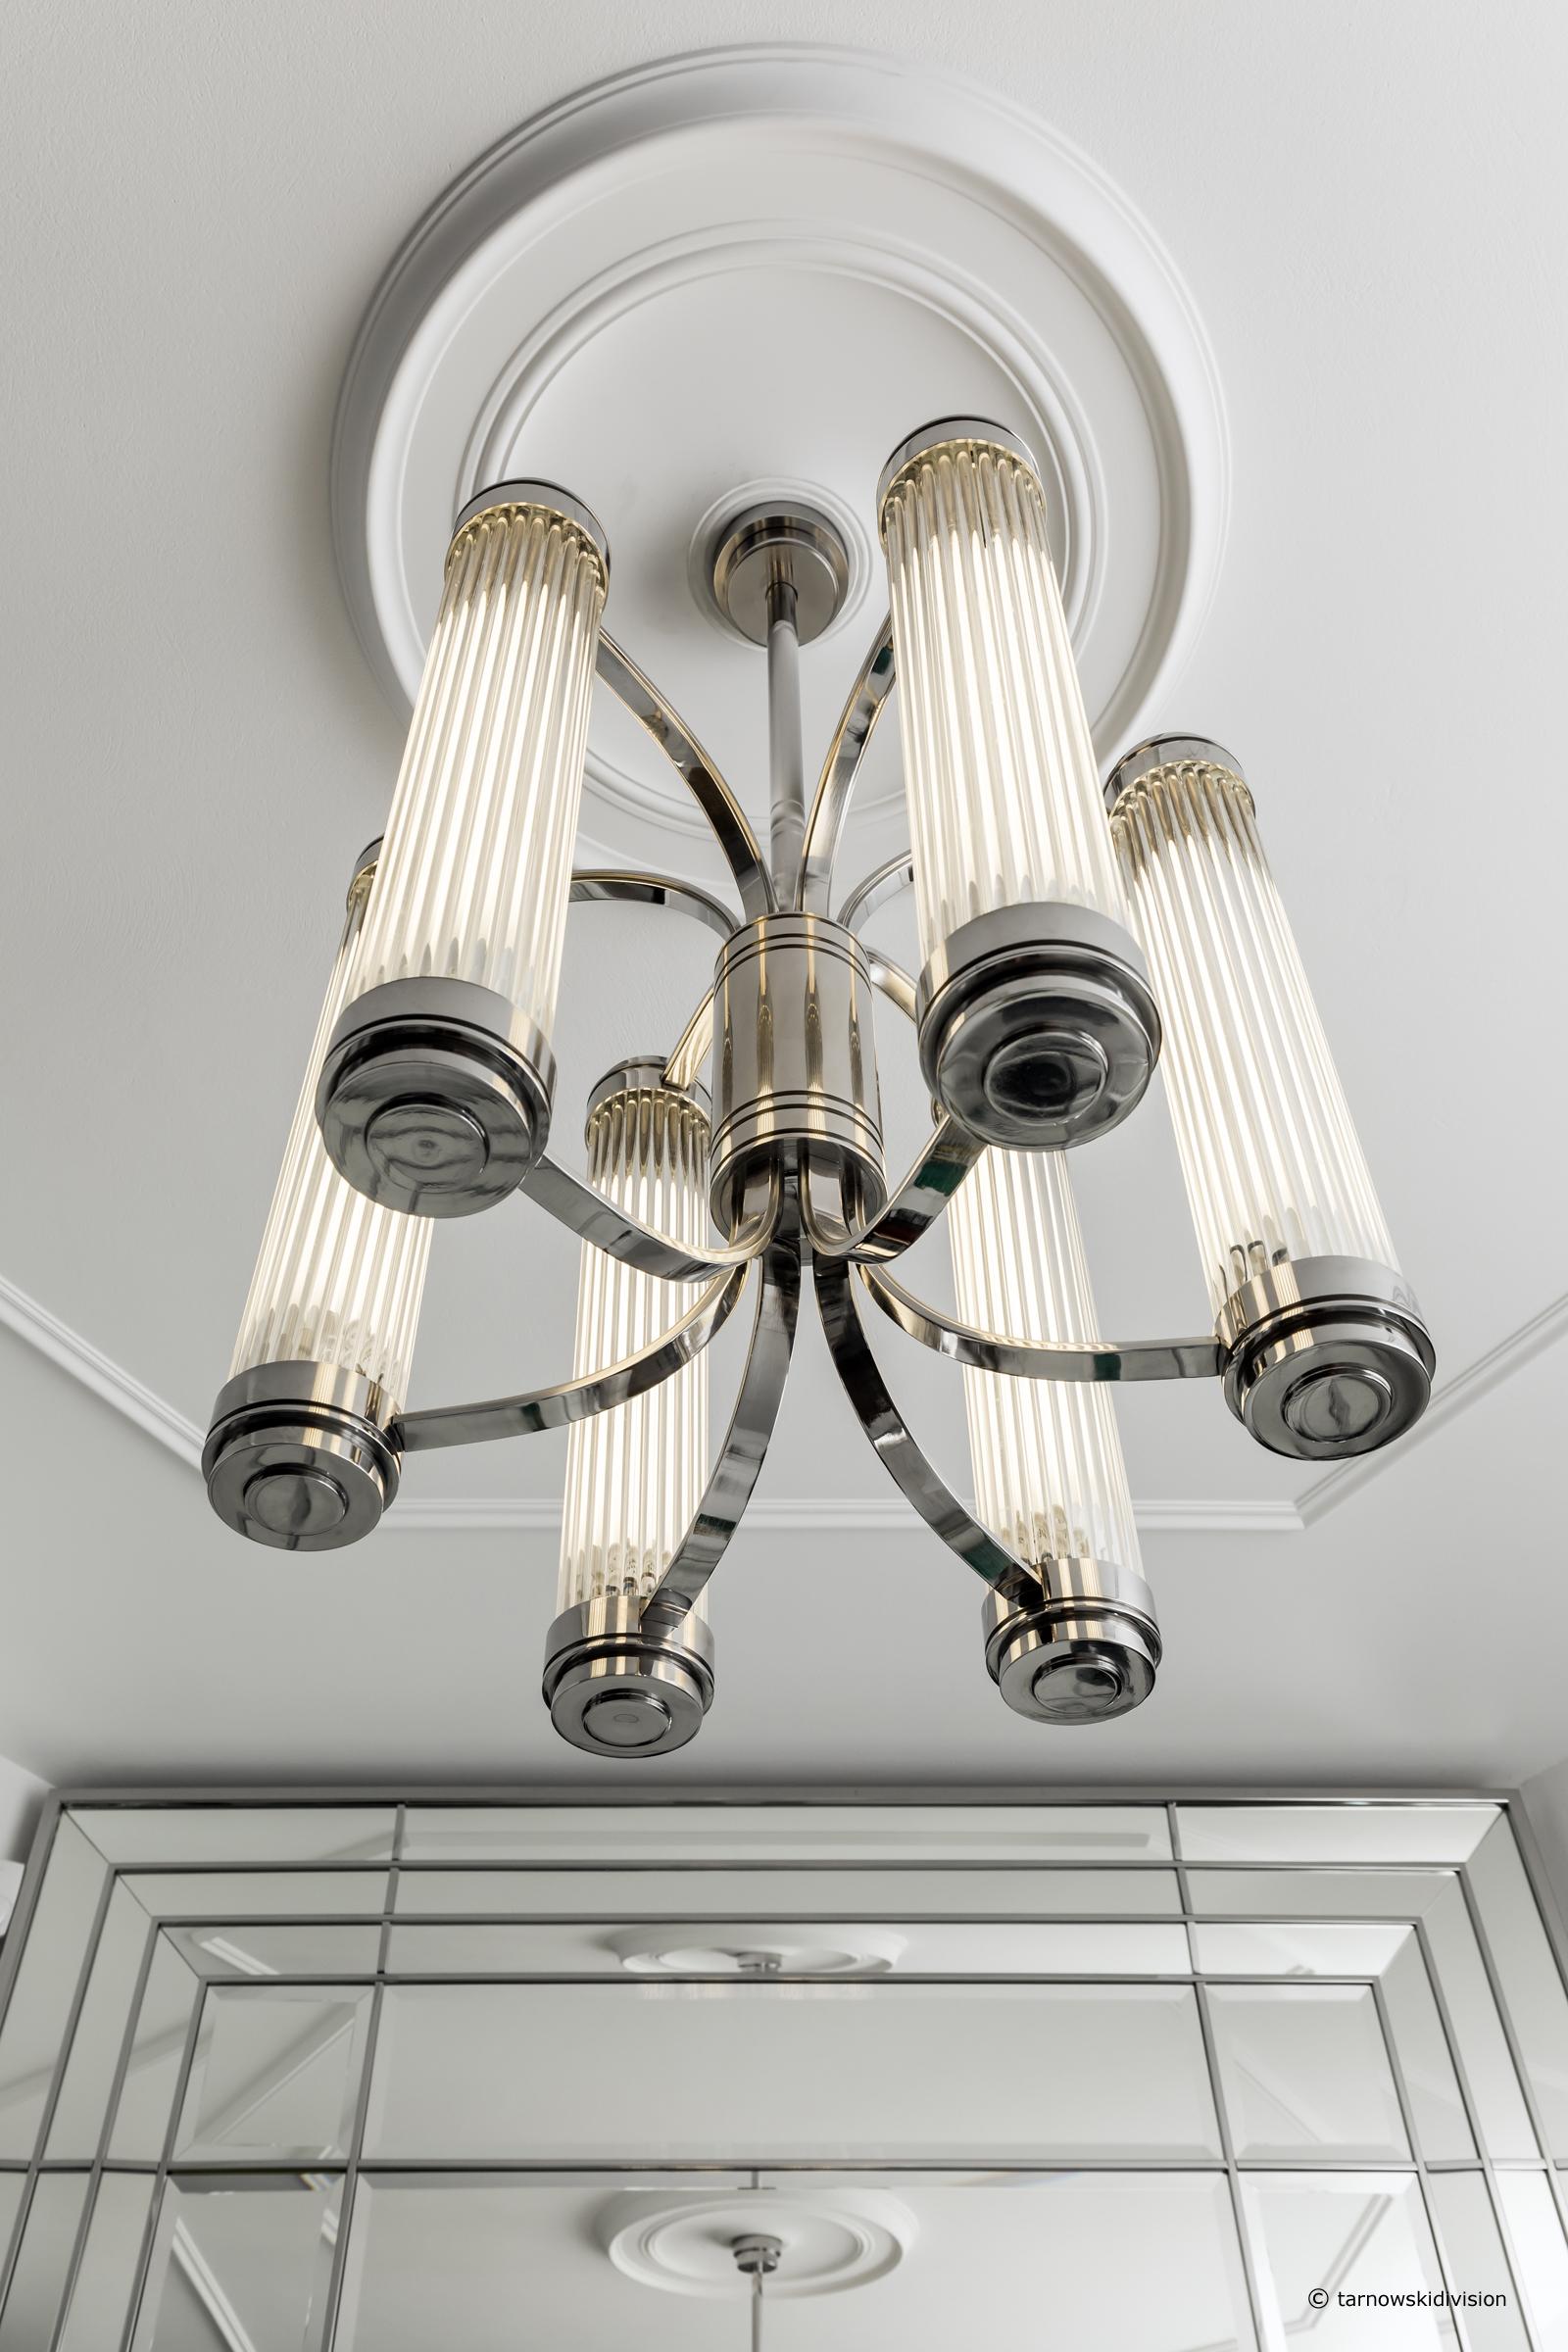 Super Art Deco lamps | Tarnowski Division LX21